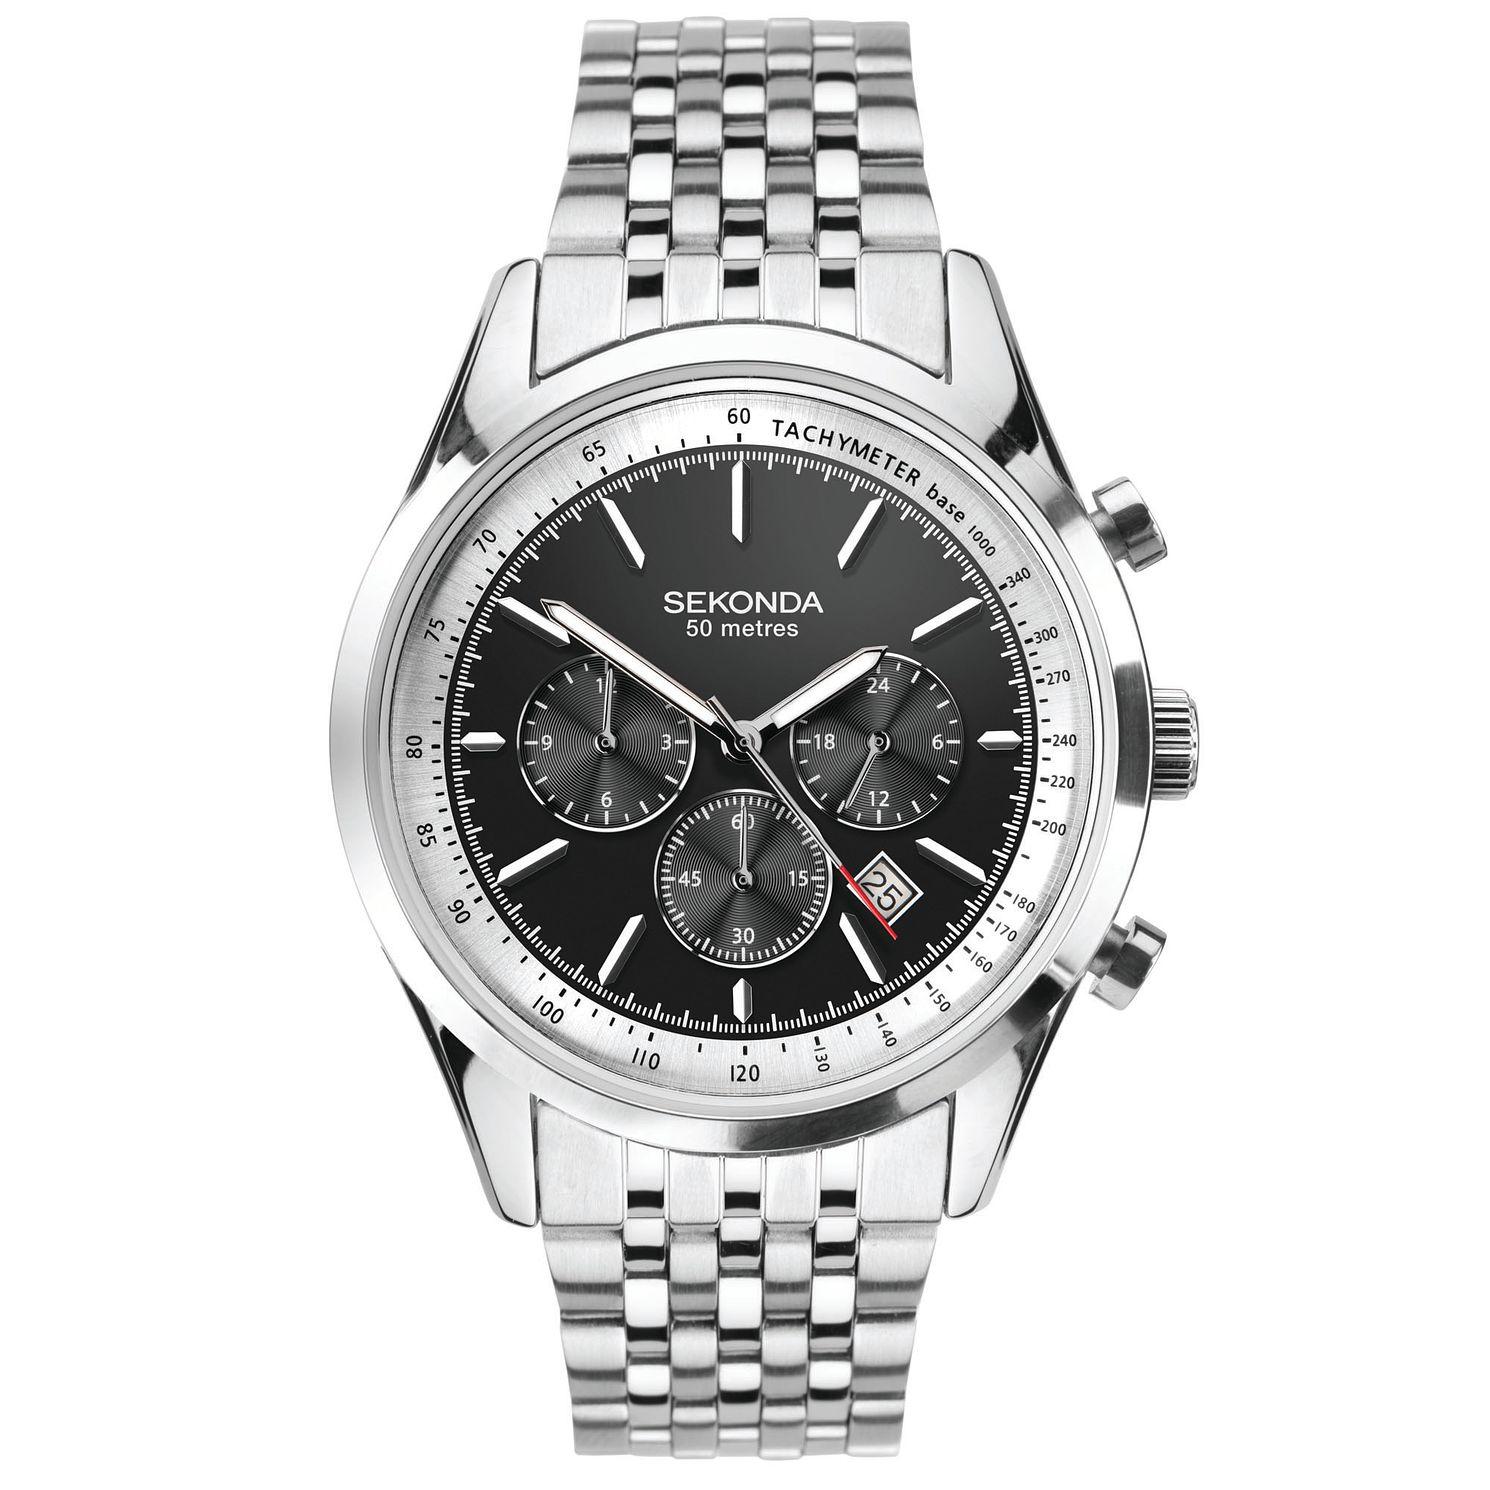 Sekonda Chronograph watch on stainless steel bracelet £34.99 H Samuel